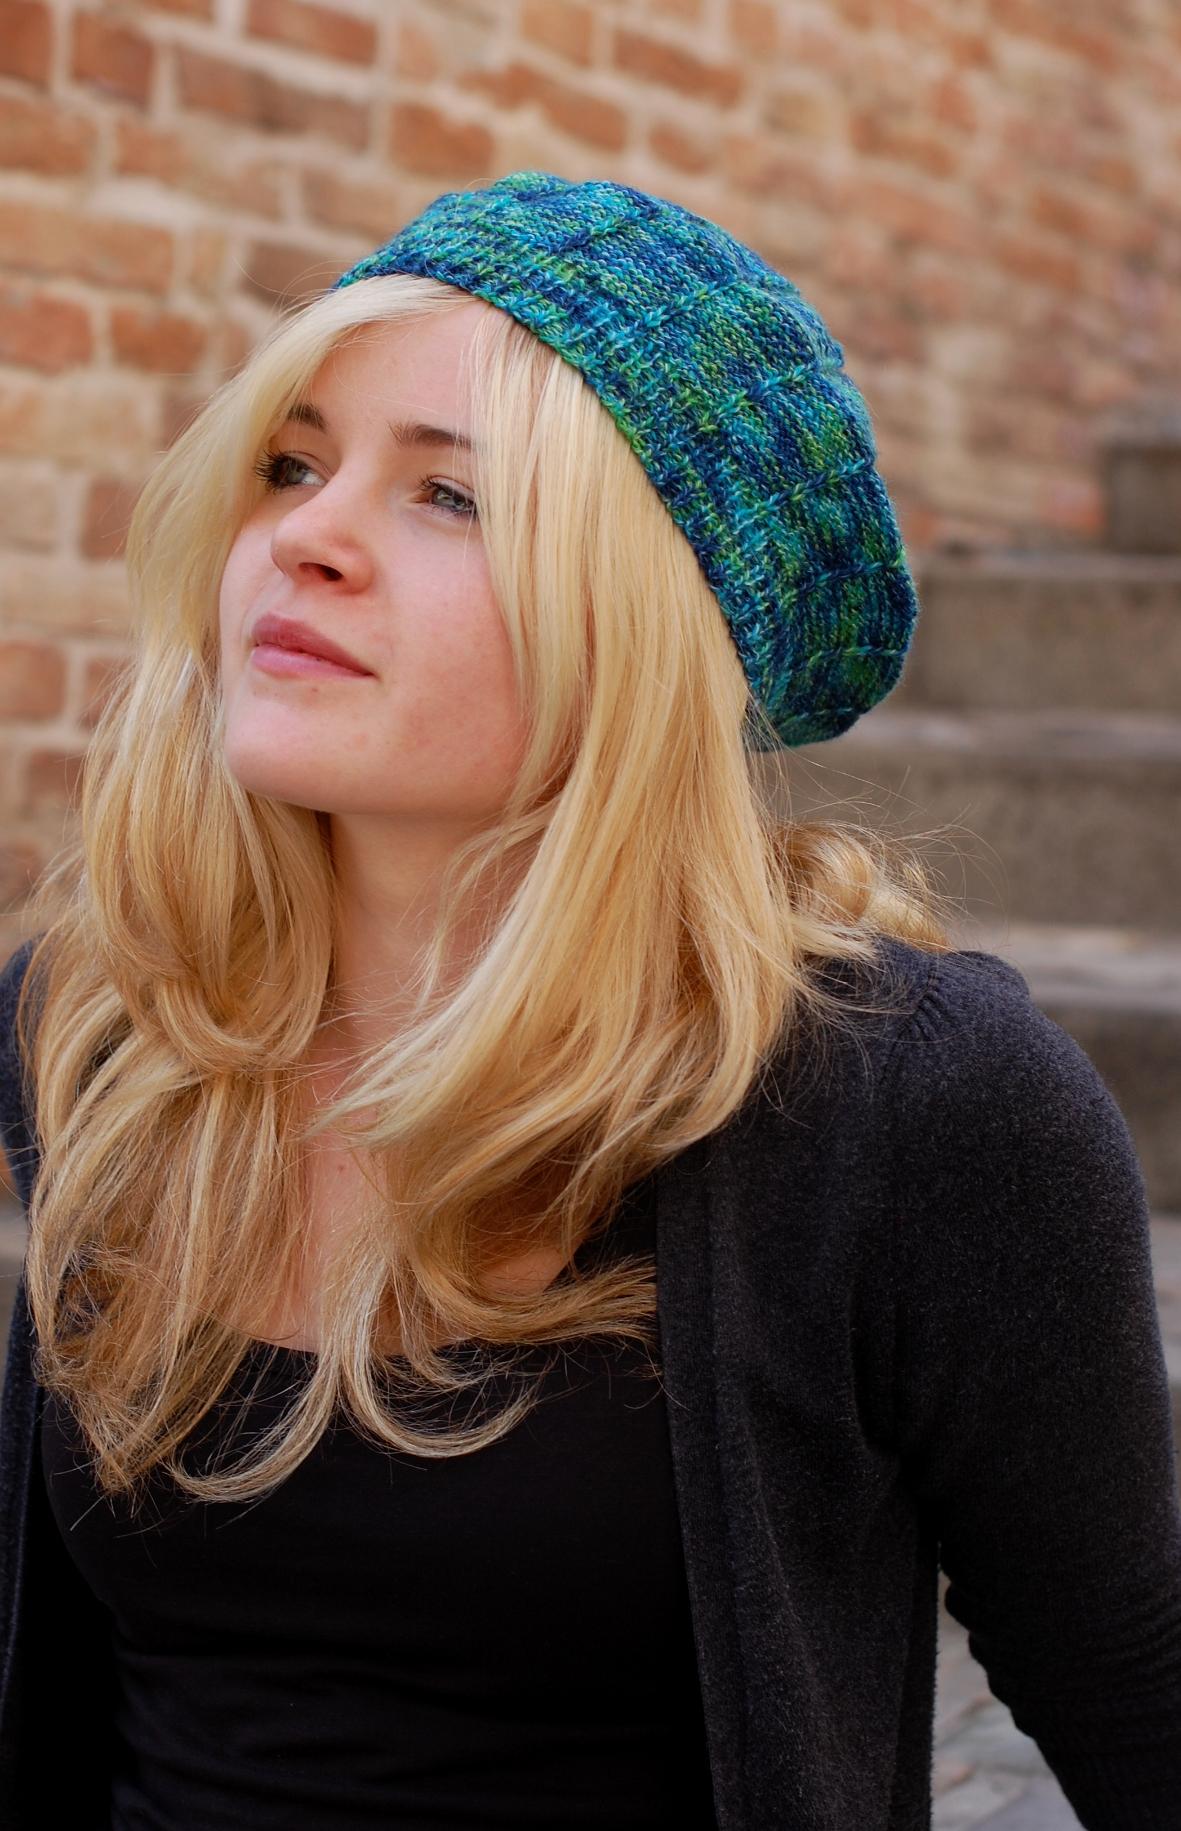 Radial variegated beret knitting pattern